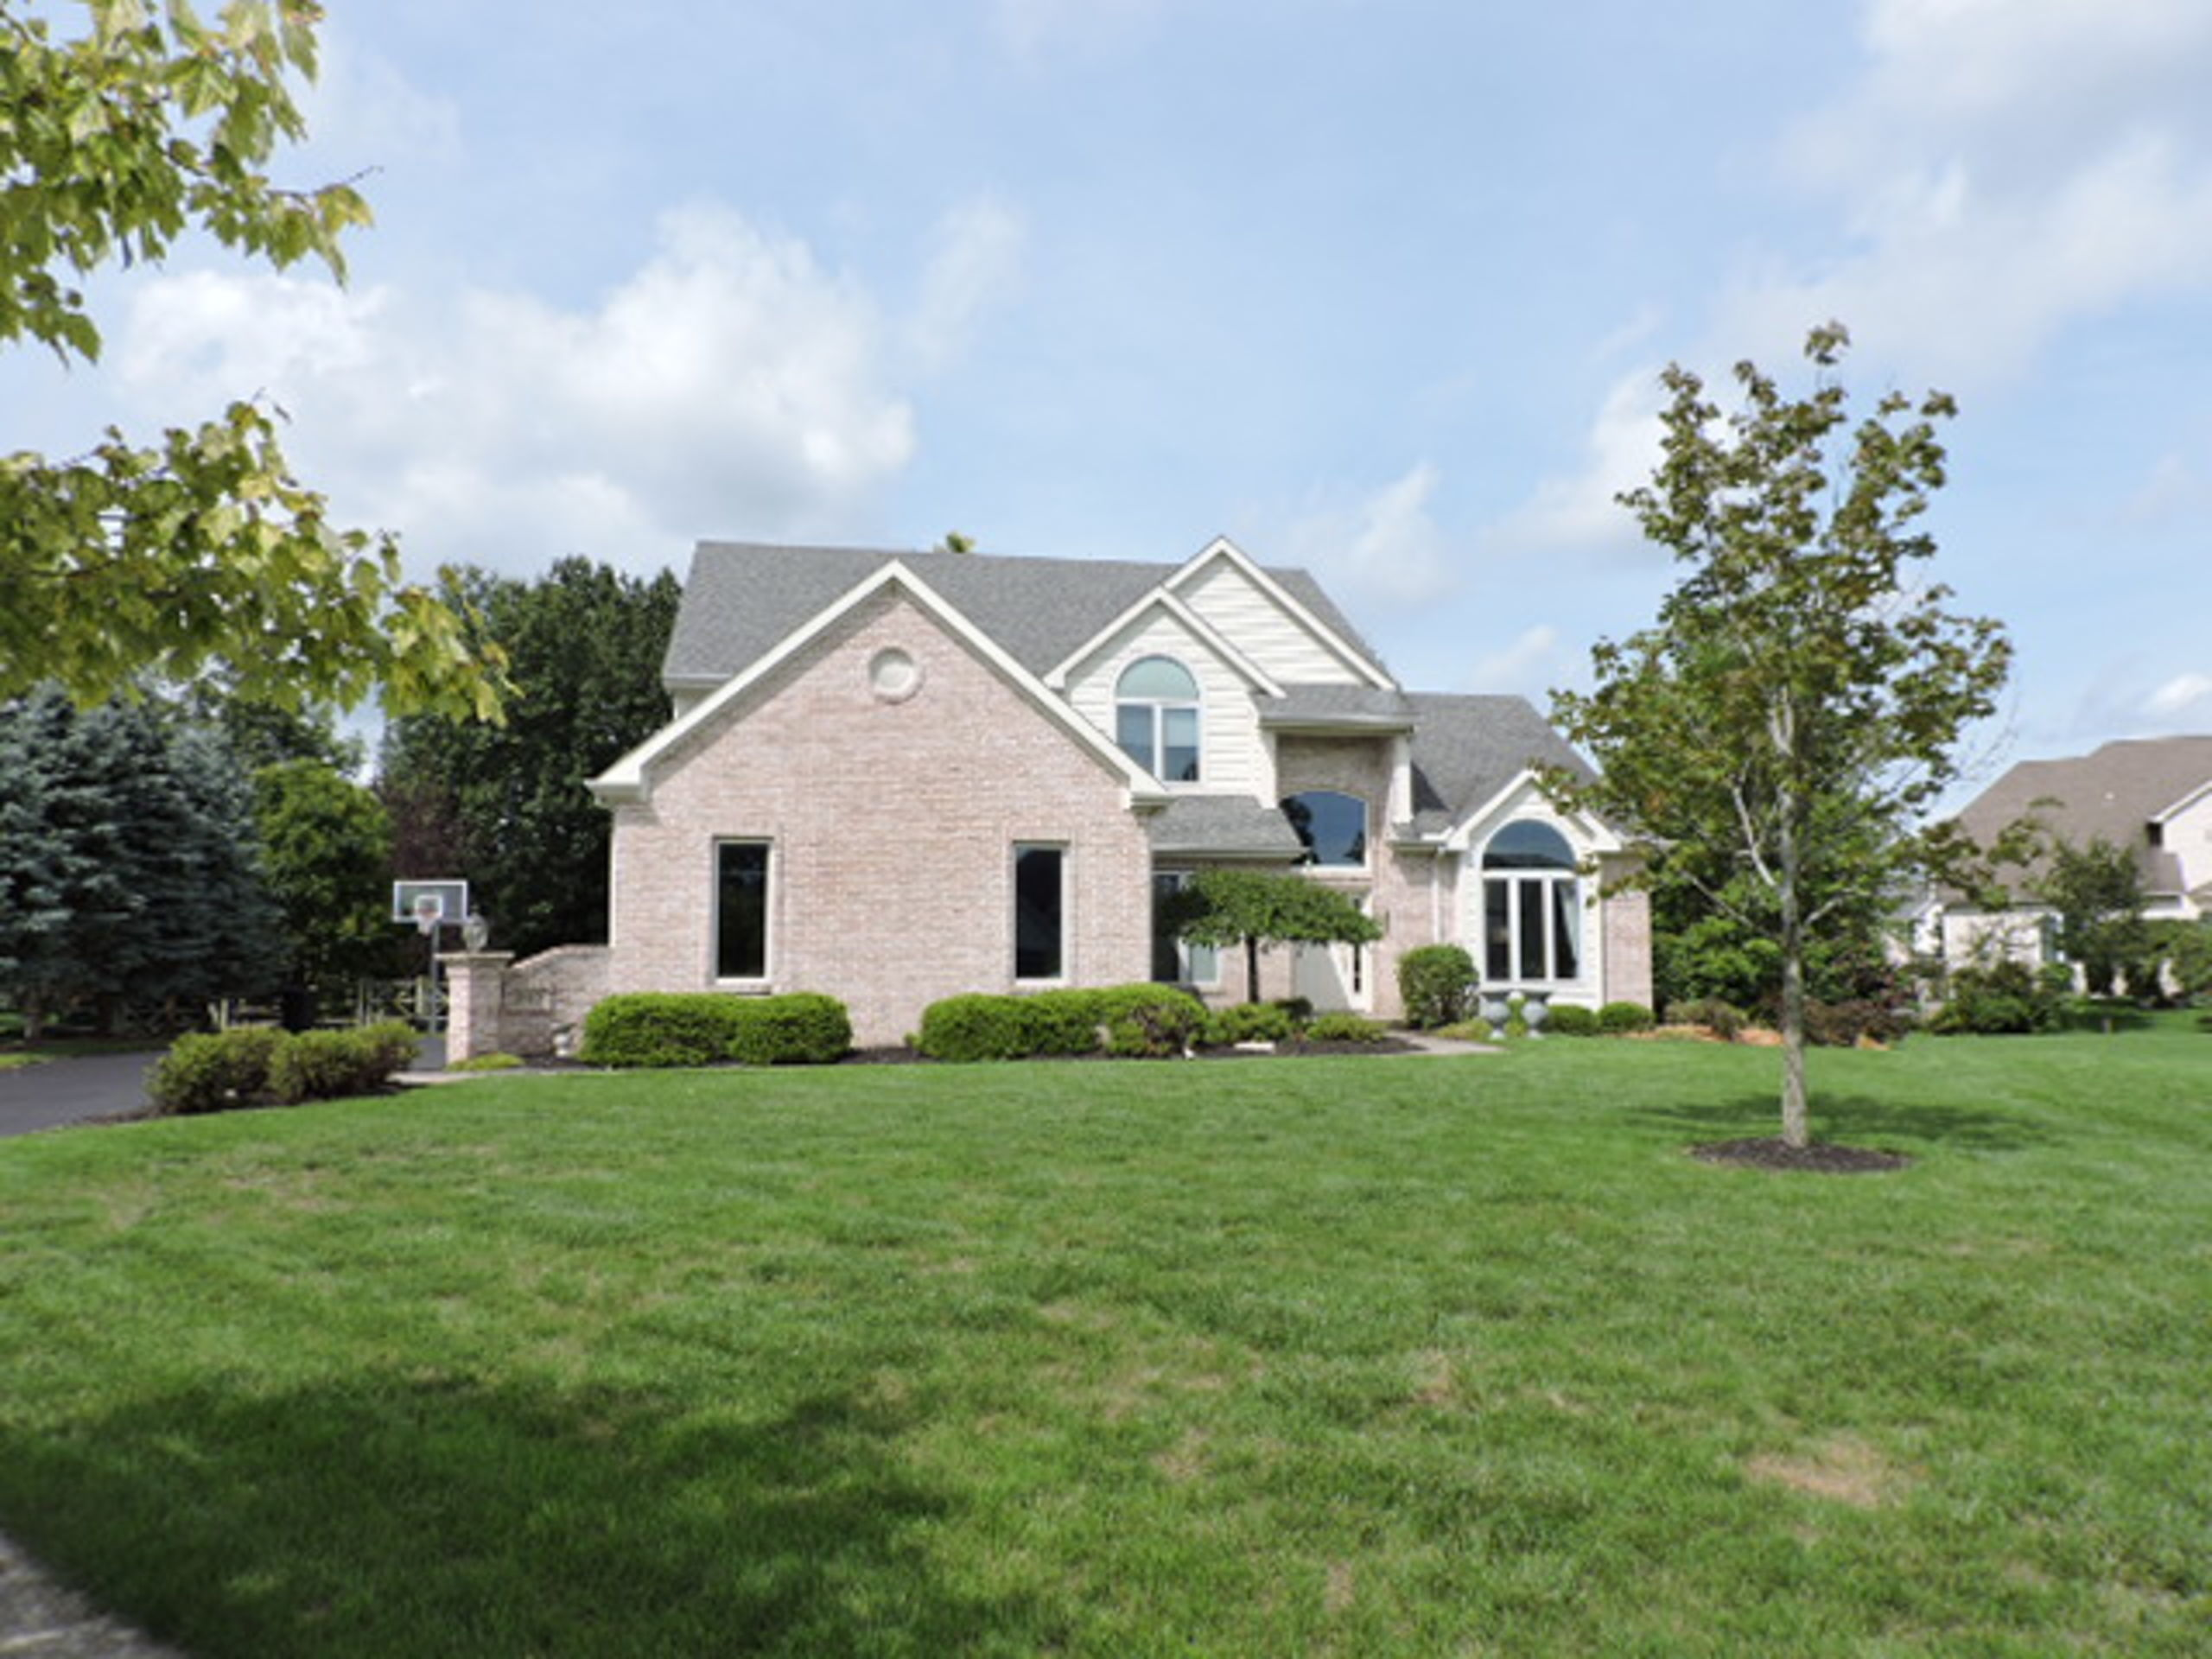 Featured Home! 7940 Slate Court Maumee Ohio 43537  List Price: $379,900